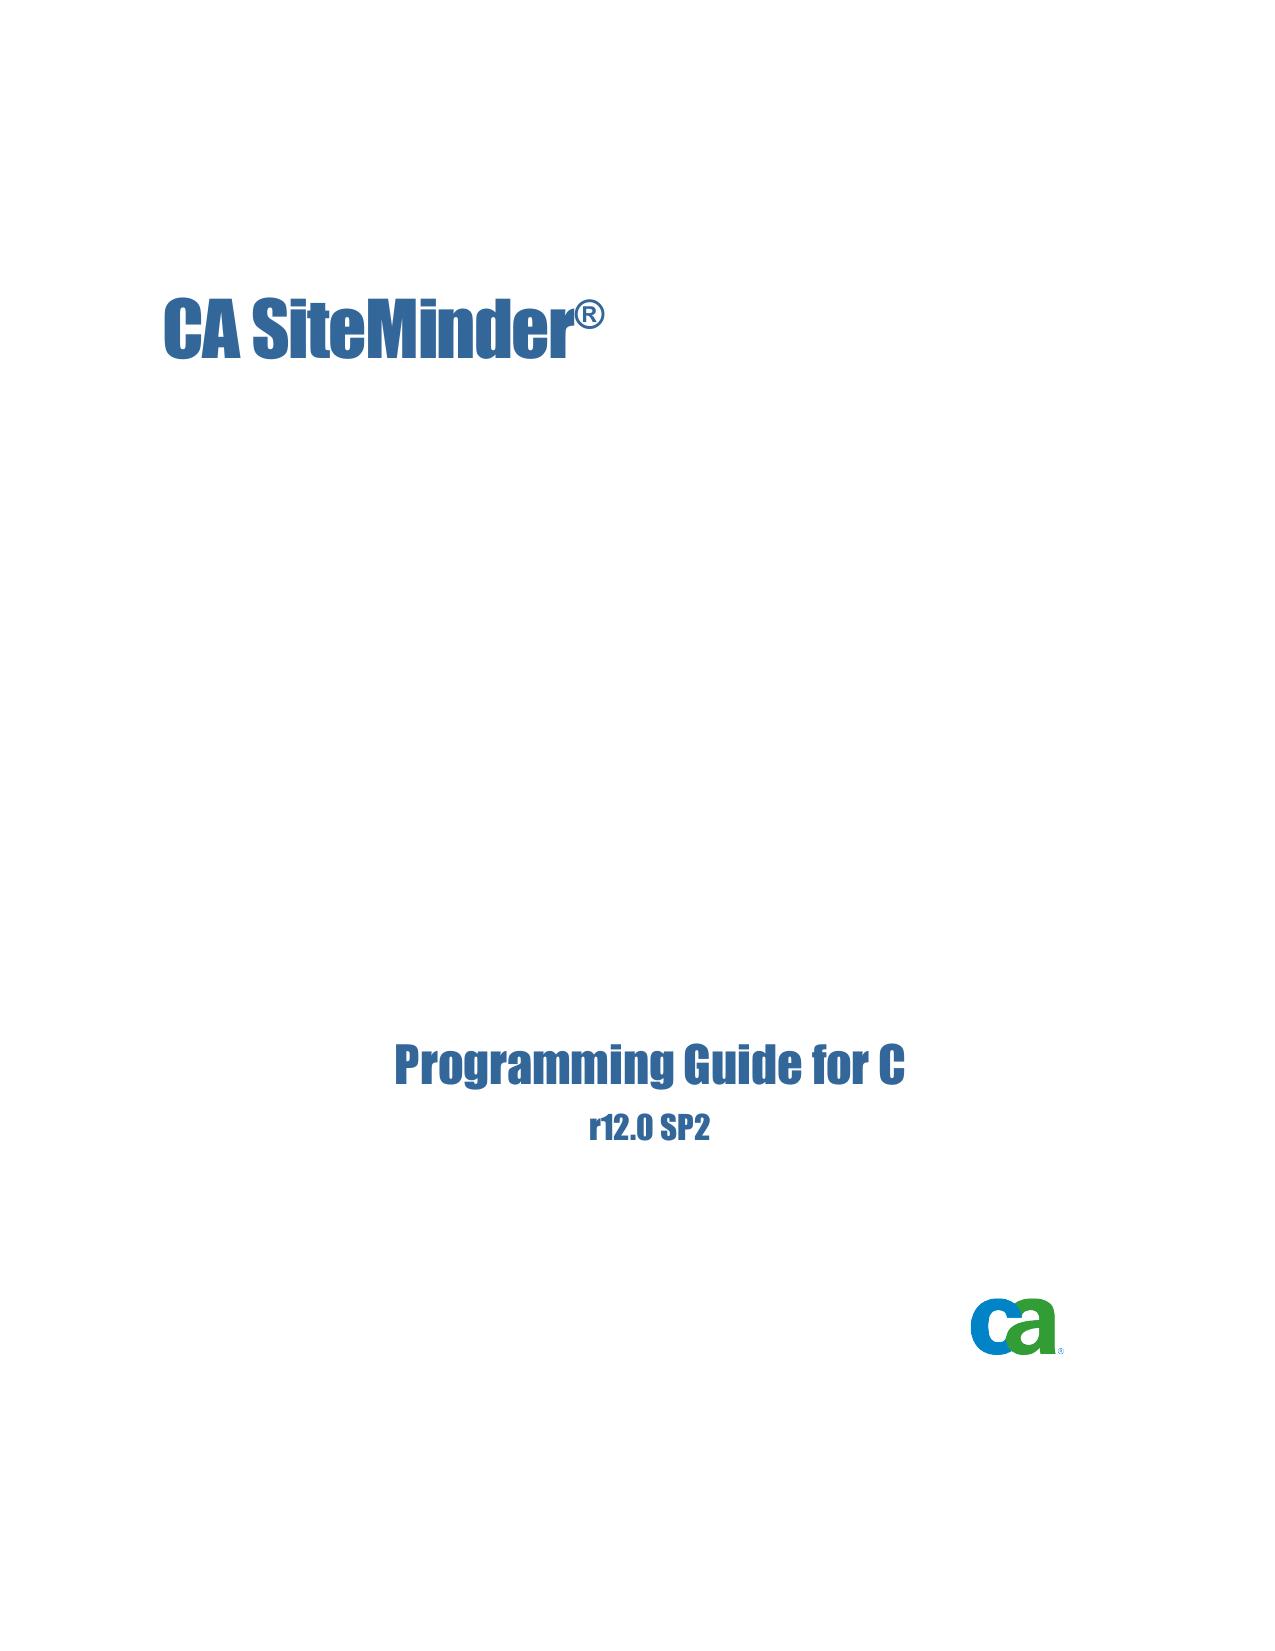 CA SiteMinder Programming Guide for C | manualzz com